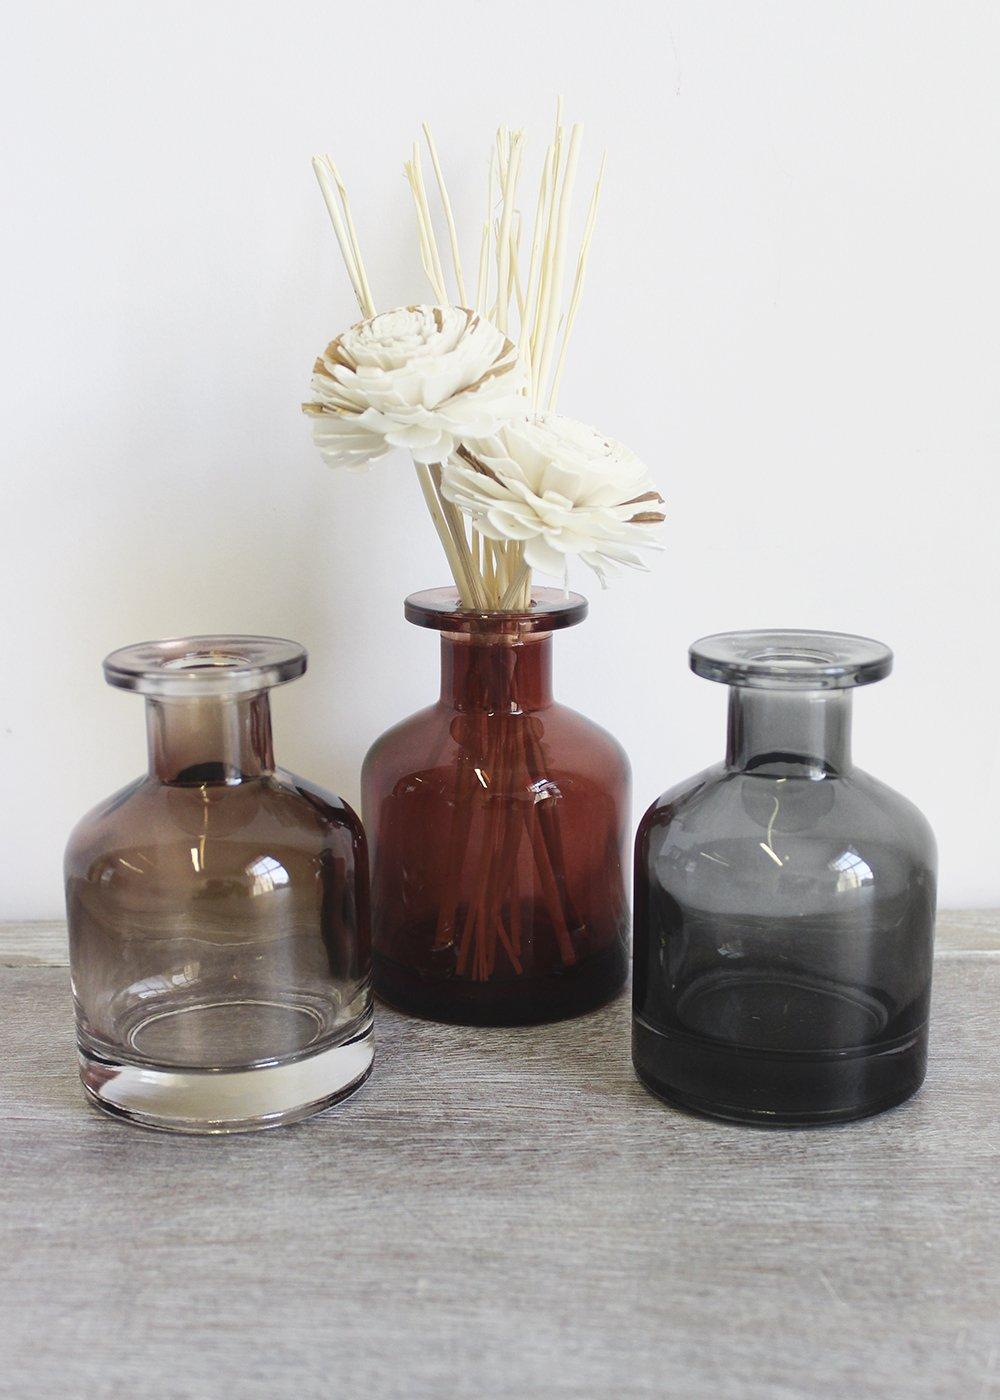 Alchemist Diffuser Bottles